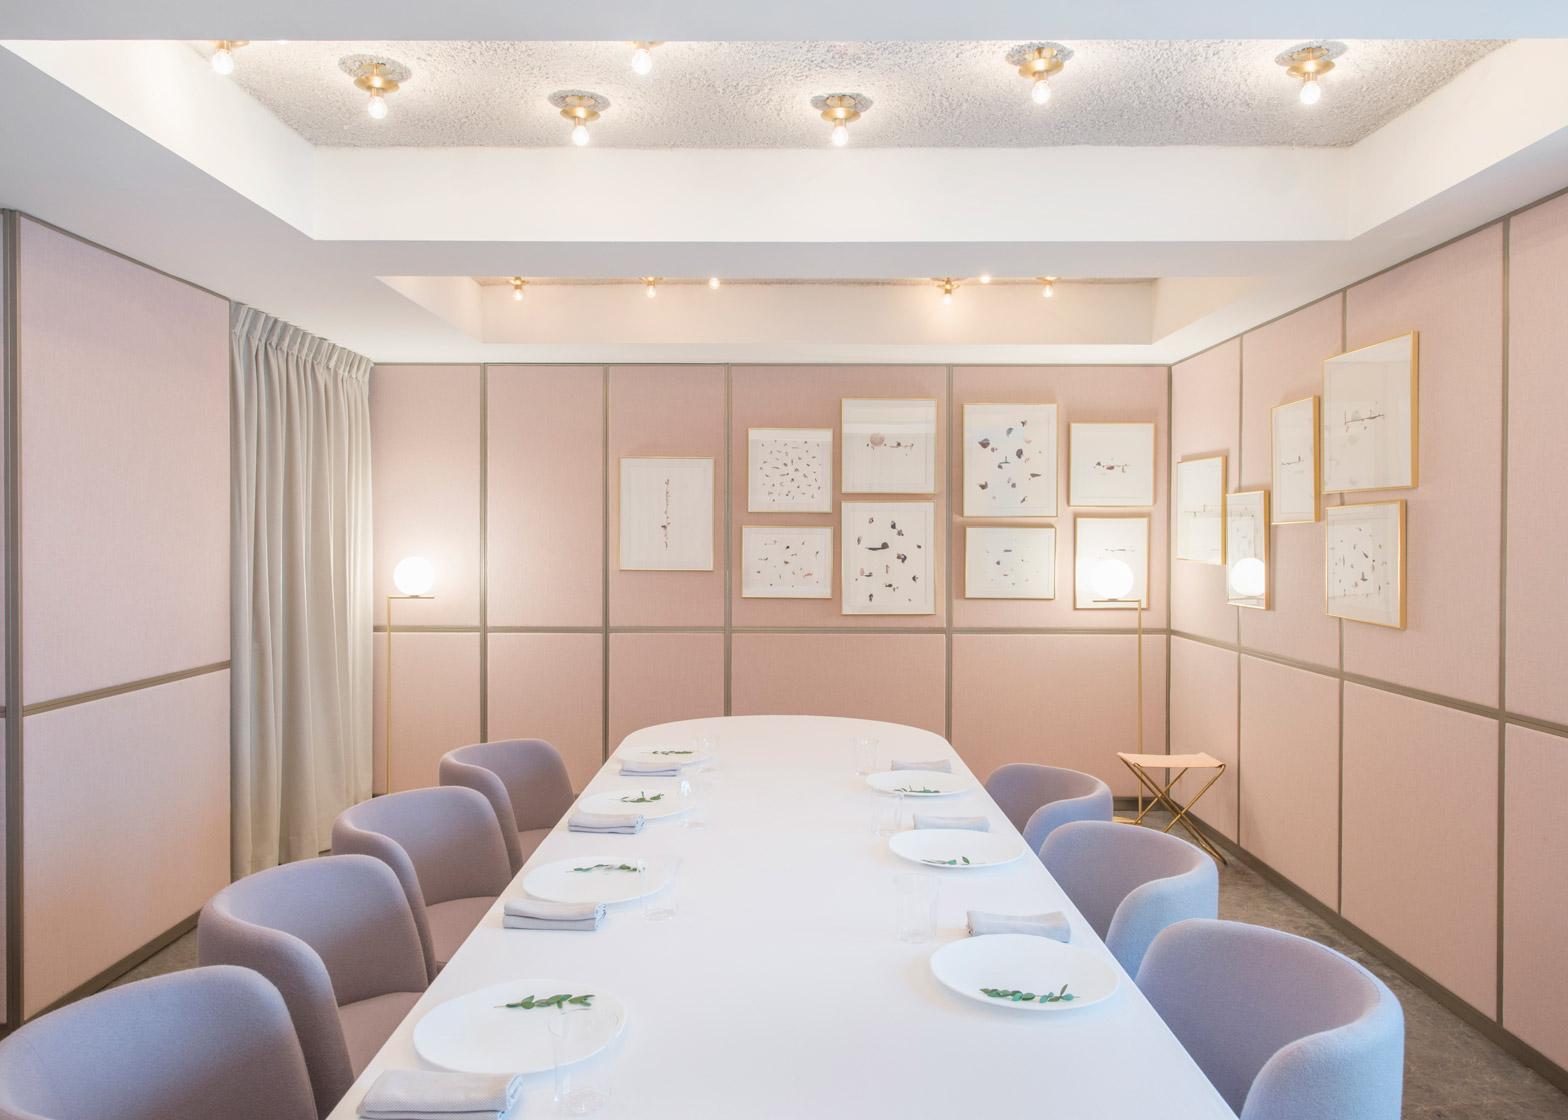 odette-universal-design-studio-singapore-restaurant-design-7